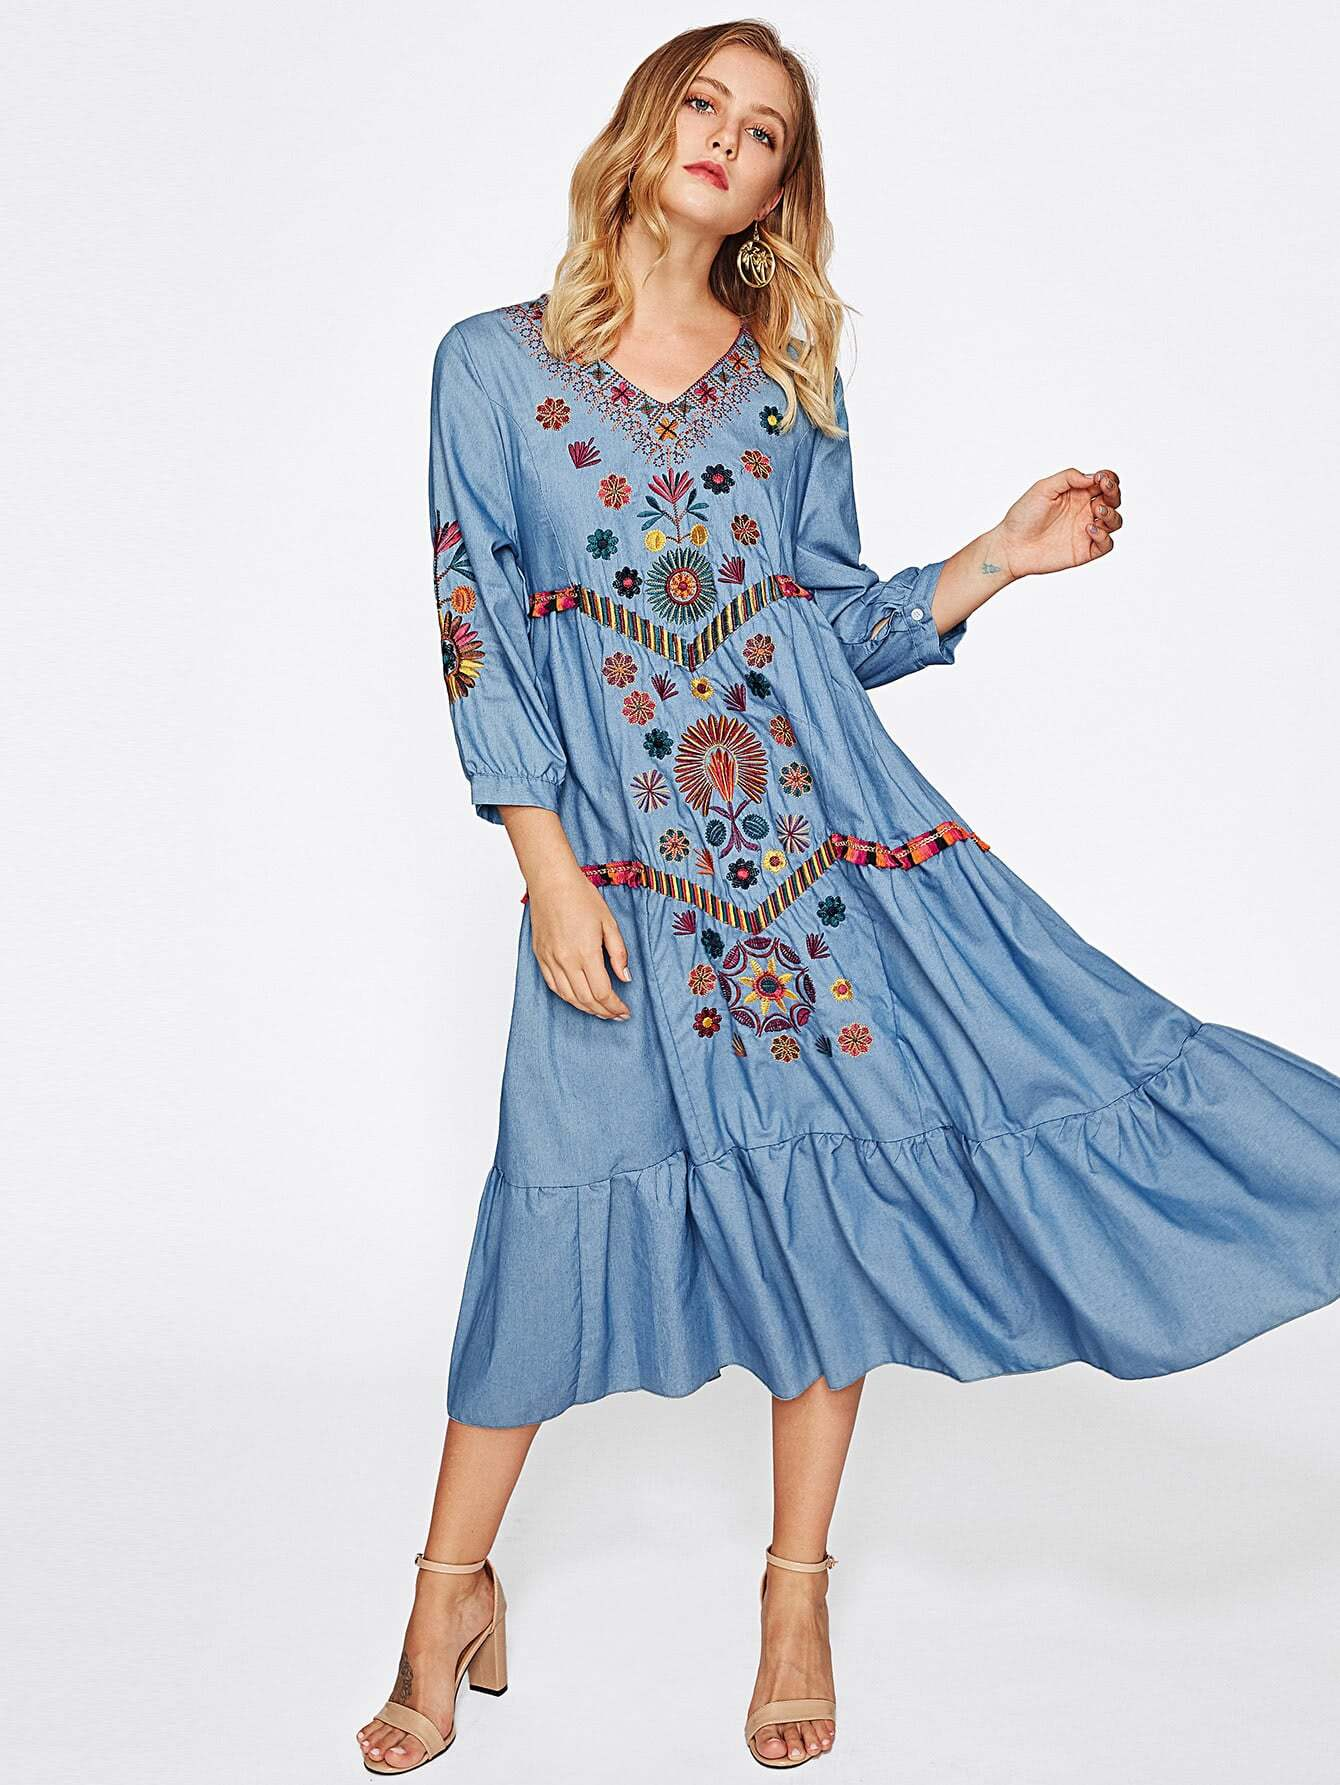 Contrast Fringe Trim Embroidered Frill Hem Chambray Dress